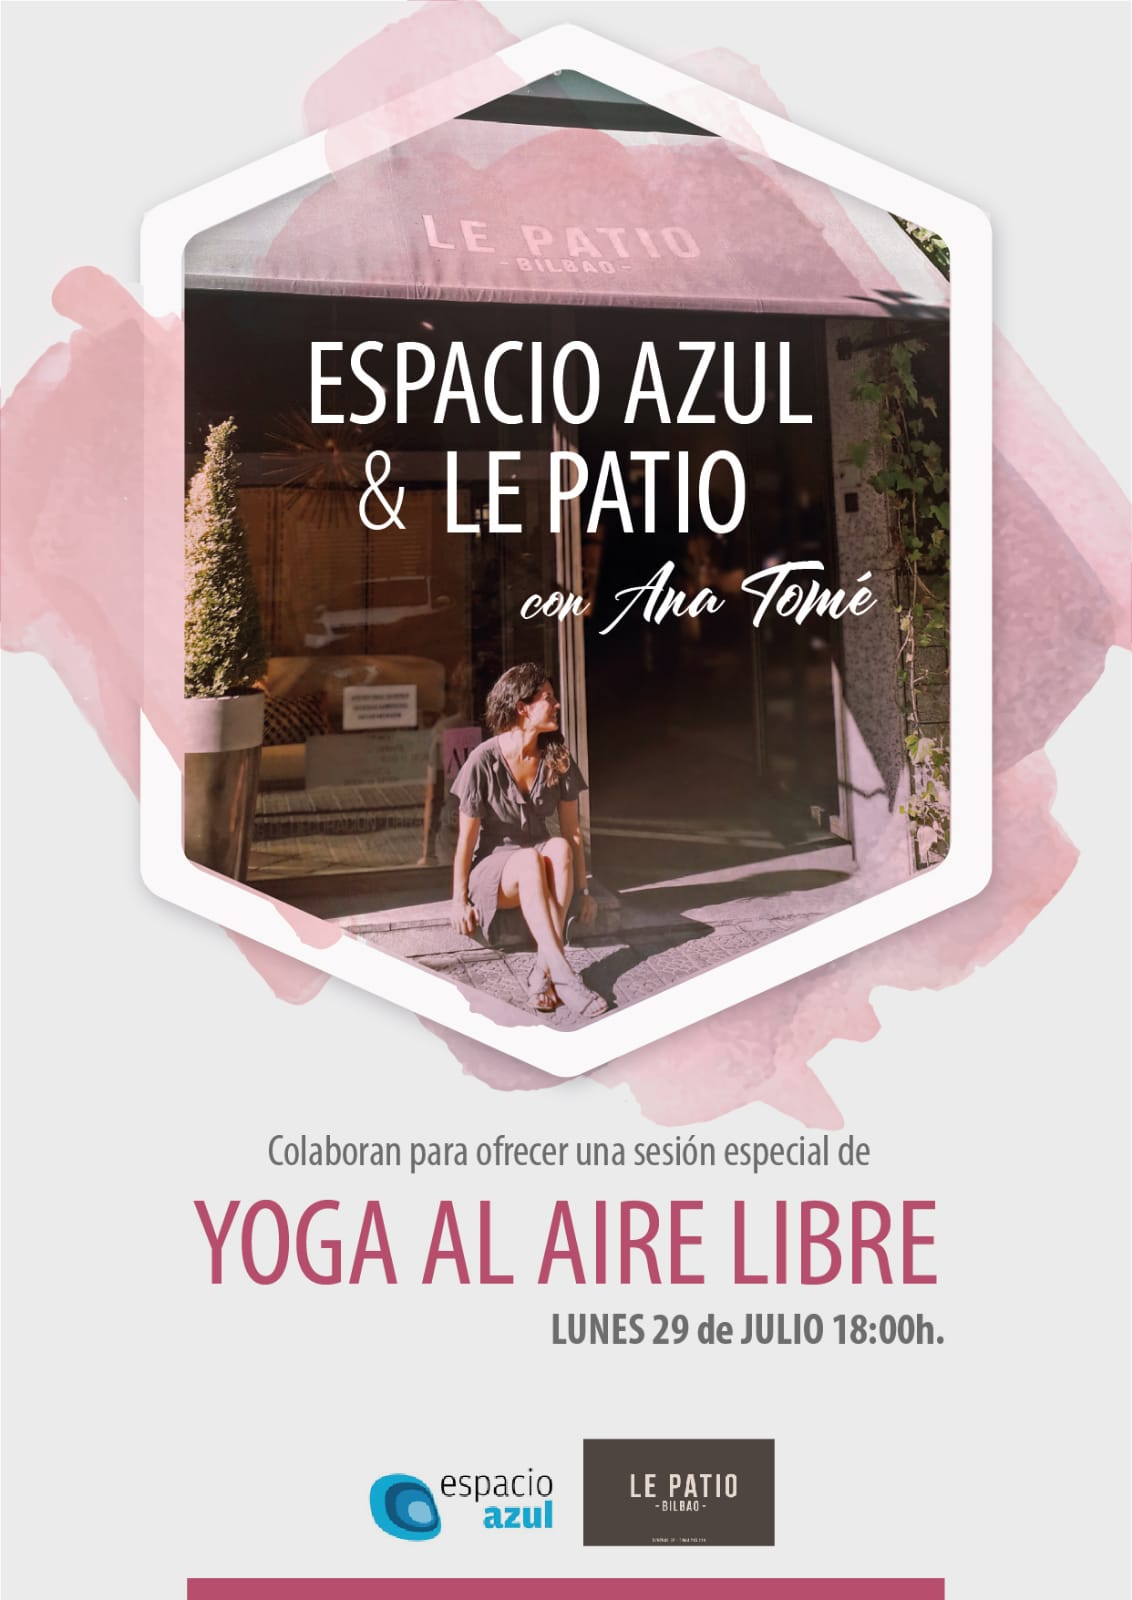 Yoga la aire libe_Espacio Azul&Le Patio